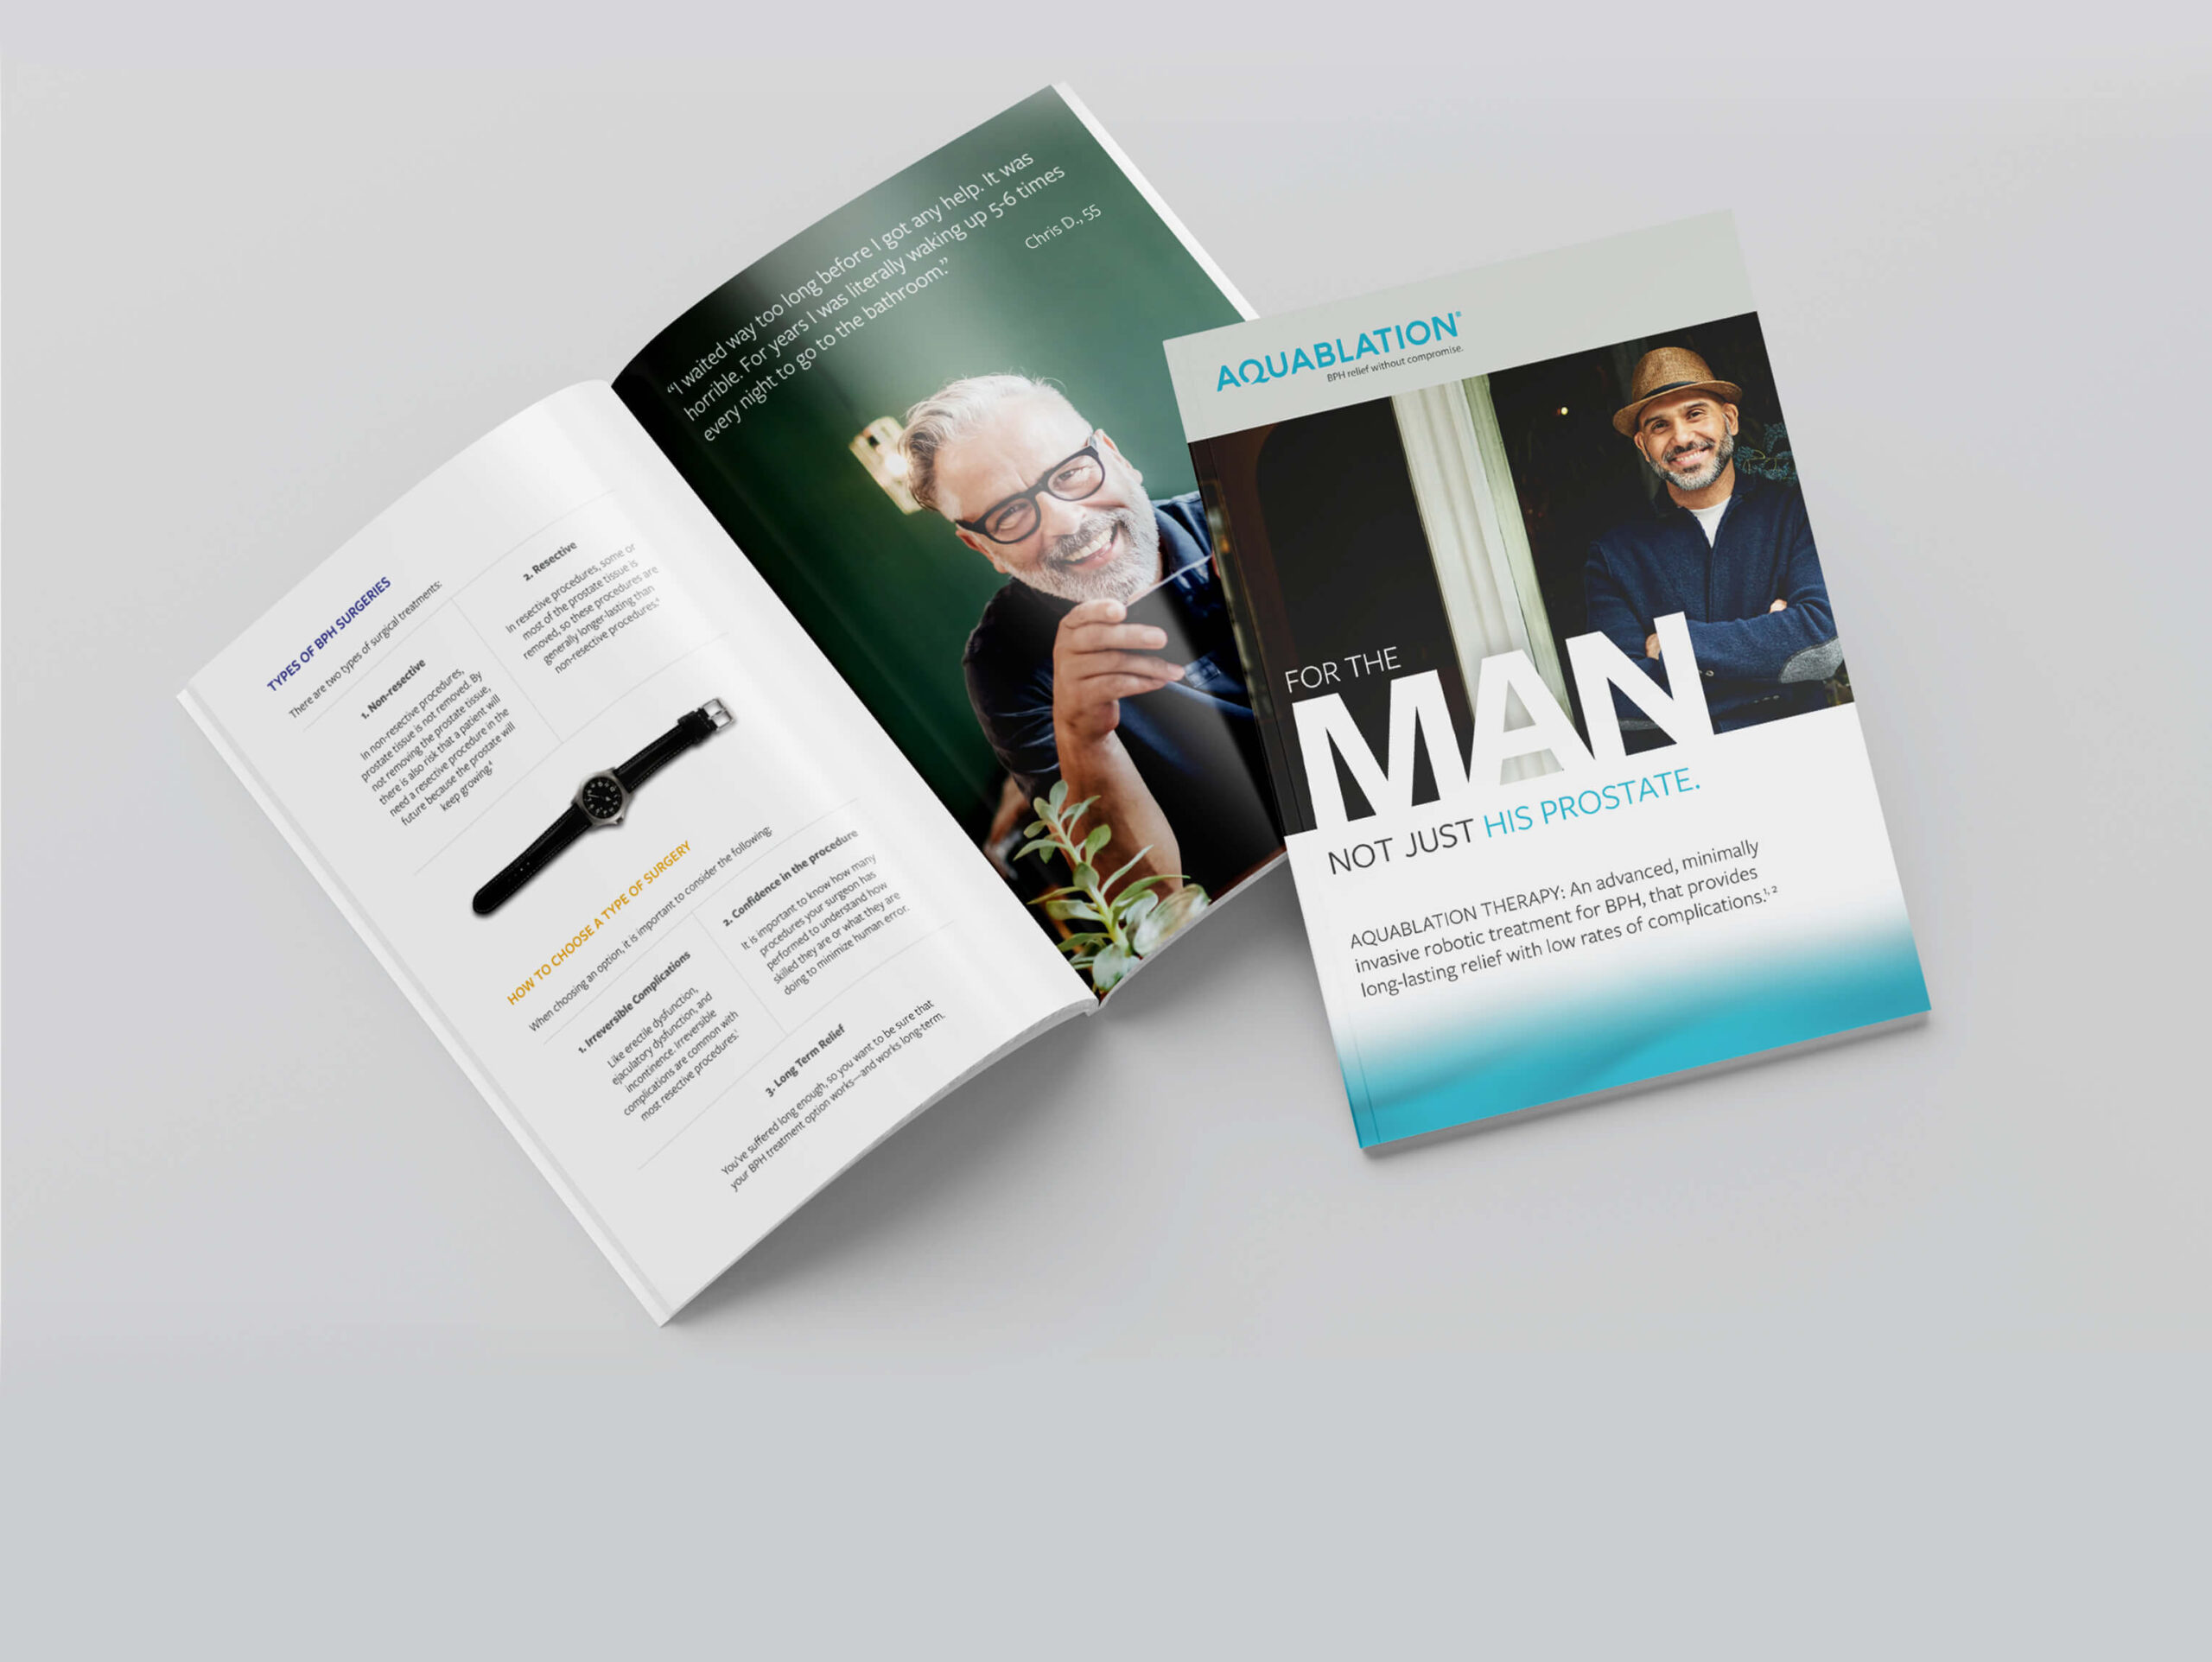 Procept Aquablation brochure